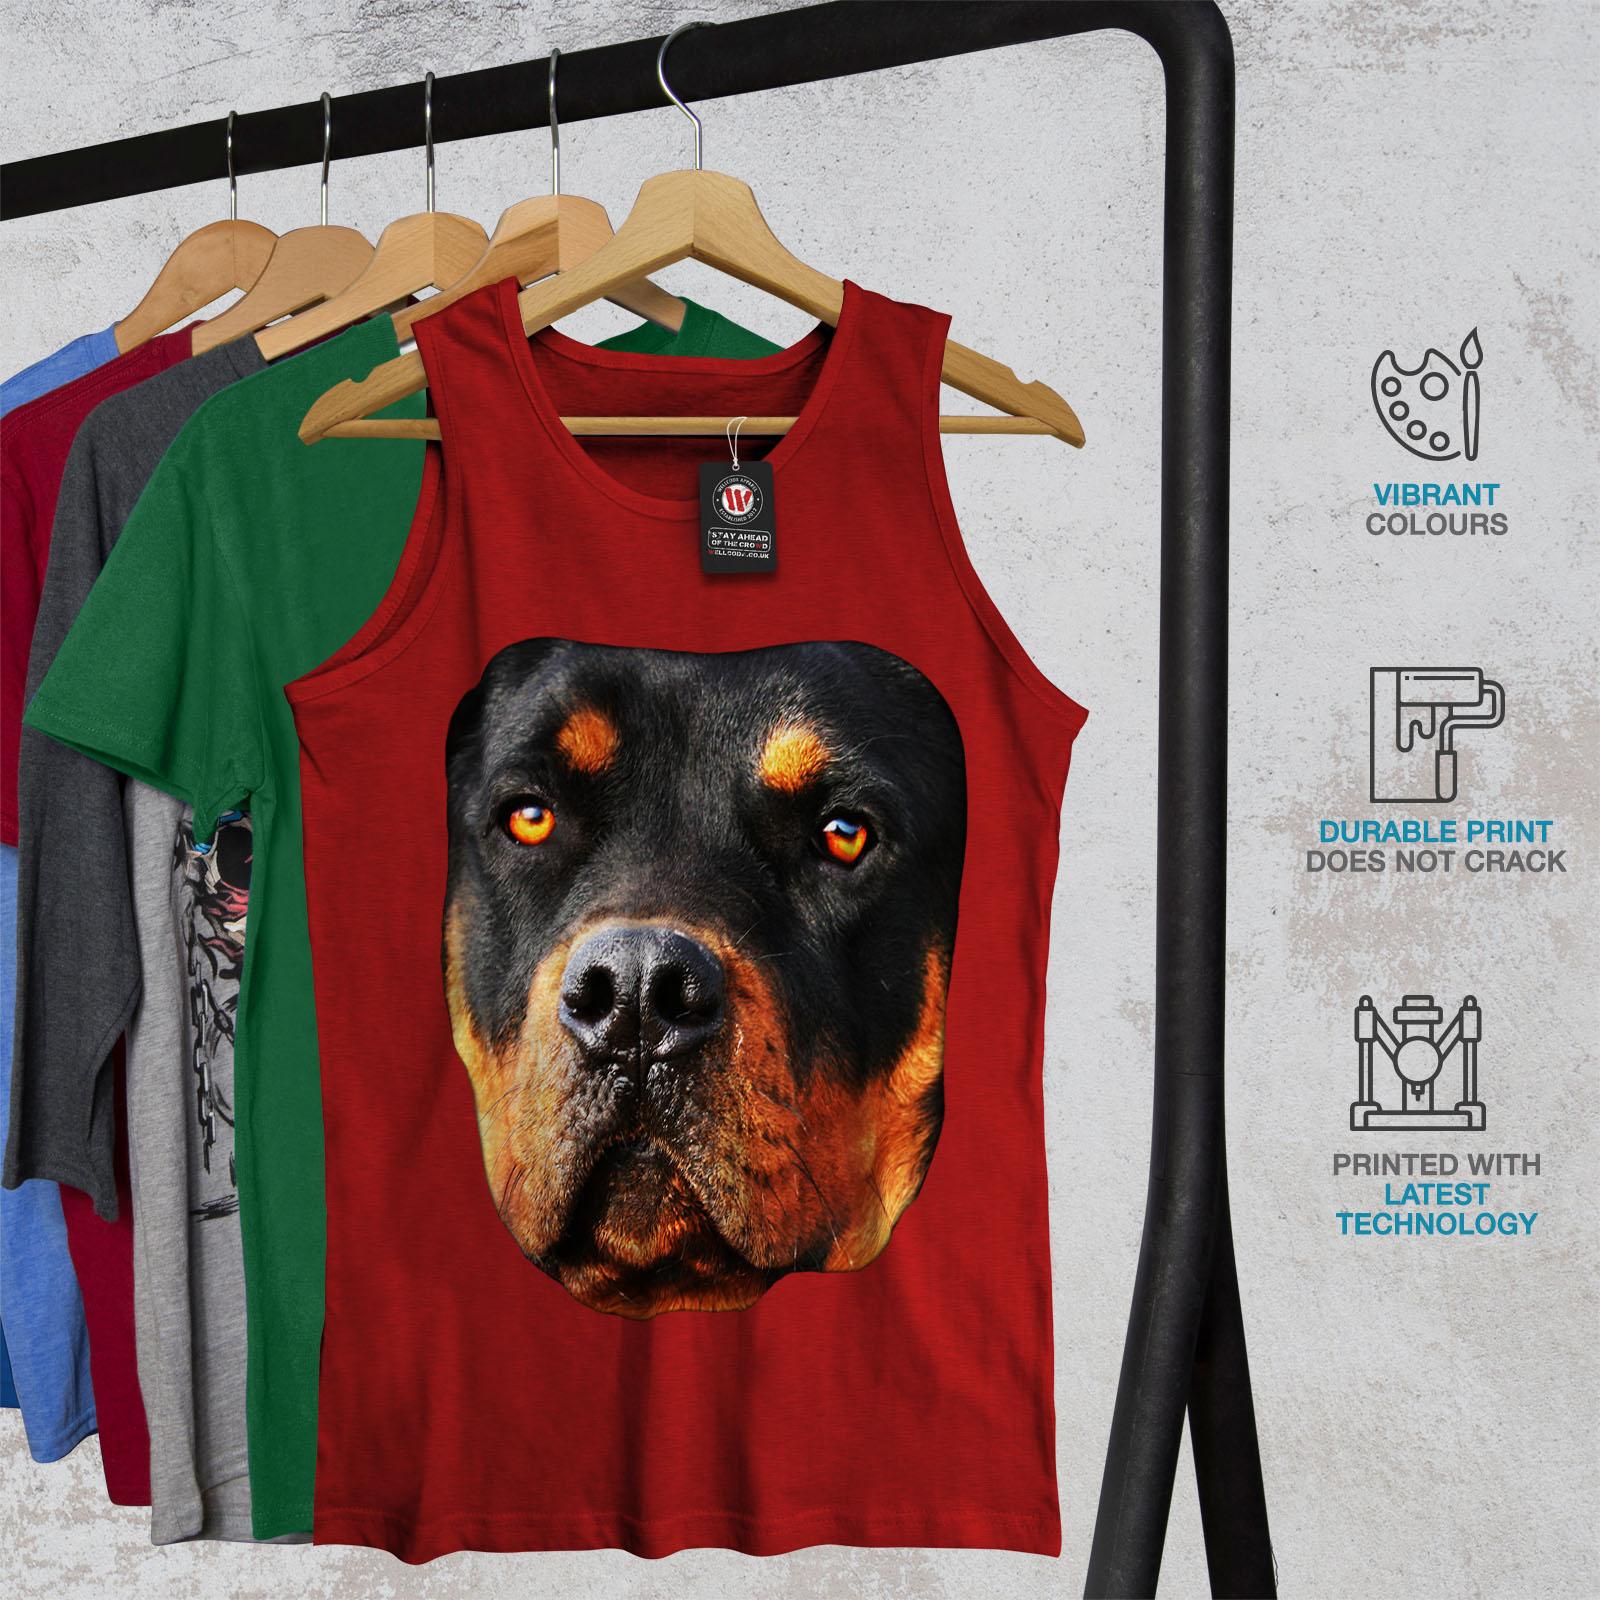 Wellcoda Rottweiler Pup Animal Mens Tank Top Lovely Active Sports Shirt